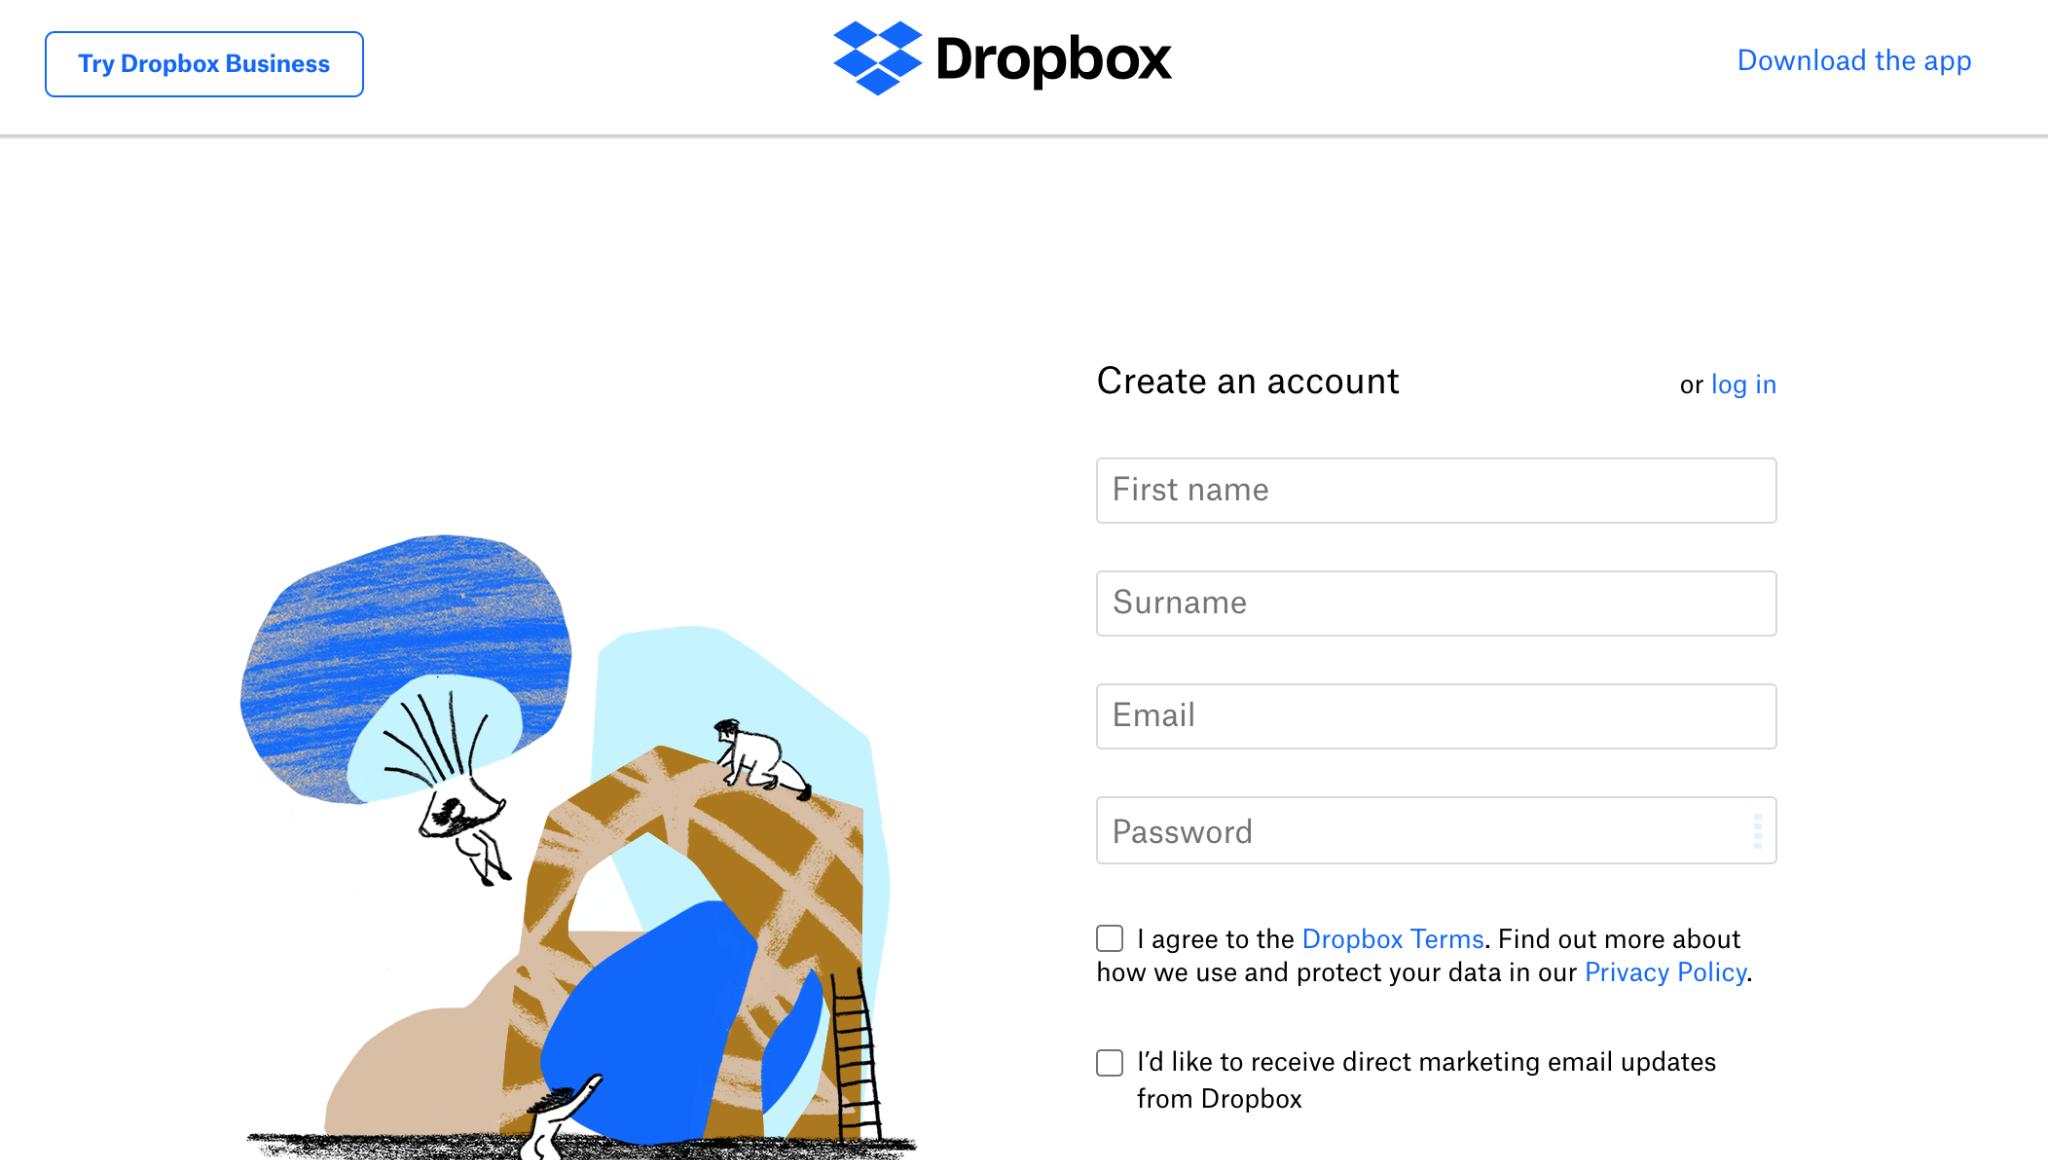 Dropbox Registration Form Image